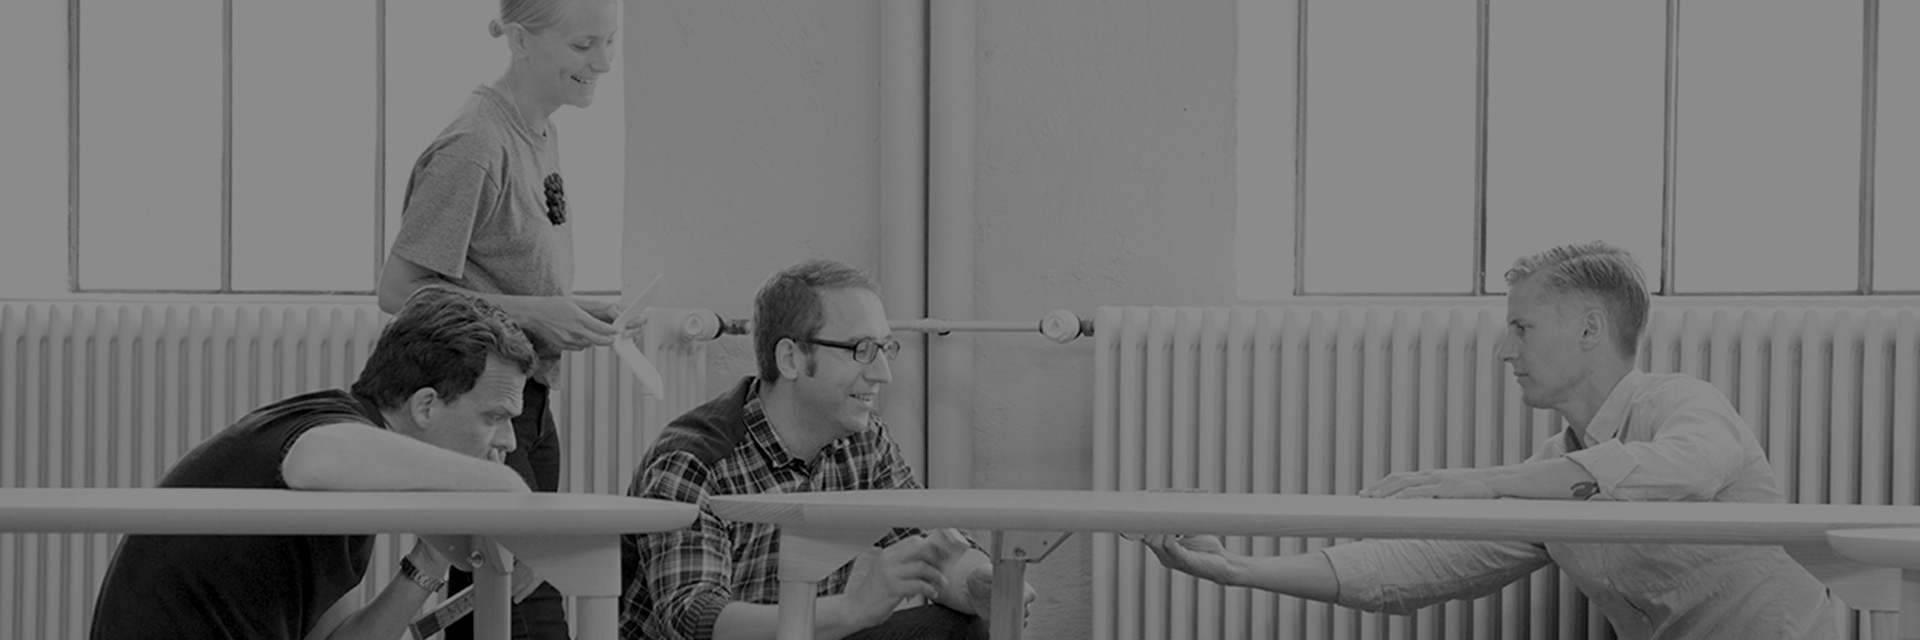 "Note Design Studio,来自瑞典的设计团队,2008年成立于斯德哥尔摩。""To note something, To get noted"",Note,是一种关注,对生活。他们来自斯堪的纳维亚半岛,对于Note来说,追求的风格并不单一,在这里,存有更多融合,在极简与表达之间,他们希望创造的是一个舒适的环境,去满足你慵懒的小习惯。 目前,工作室共有7位成员,分别担当不同的职能,面对一个项目,并没有一个固定的工作流程,也许一切皆有可能,平面设计师可能也会去做一个建筑项目,""我们需要新的、开阔的视野去做每一个项目,并找到每一个它们的独特之处。"""